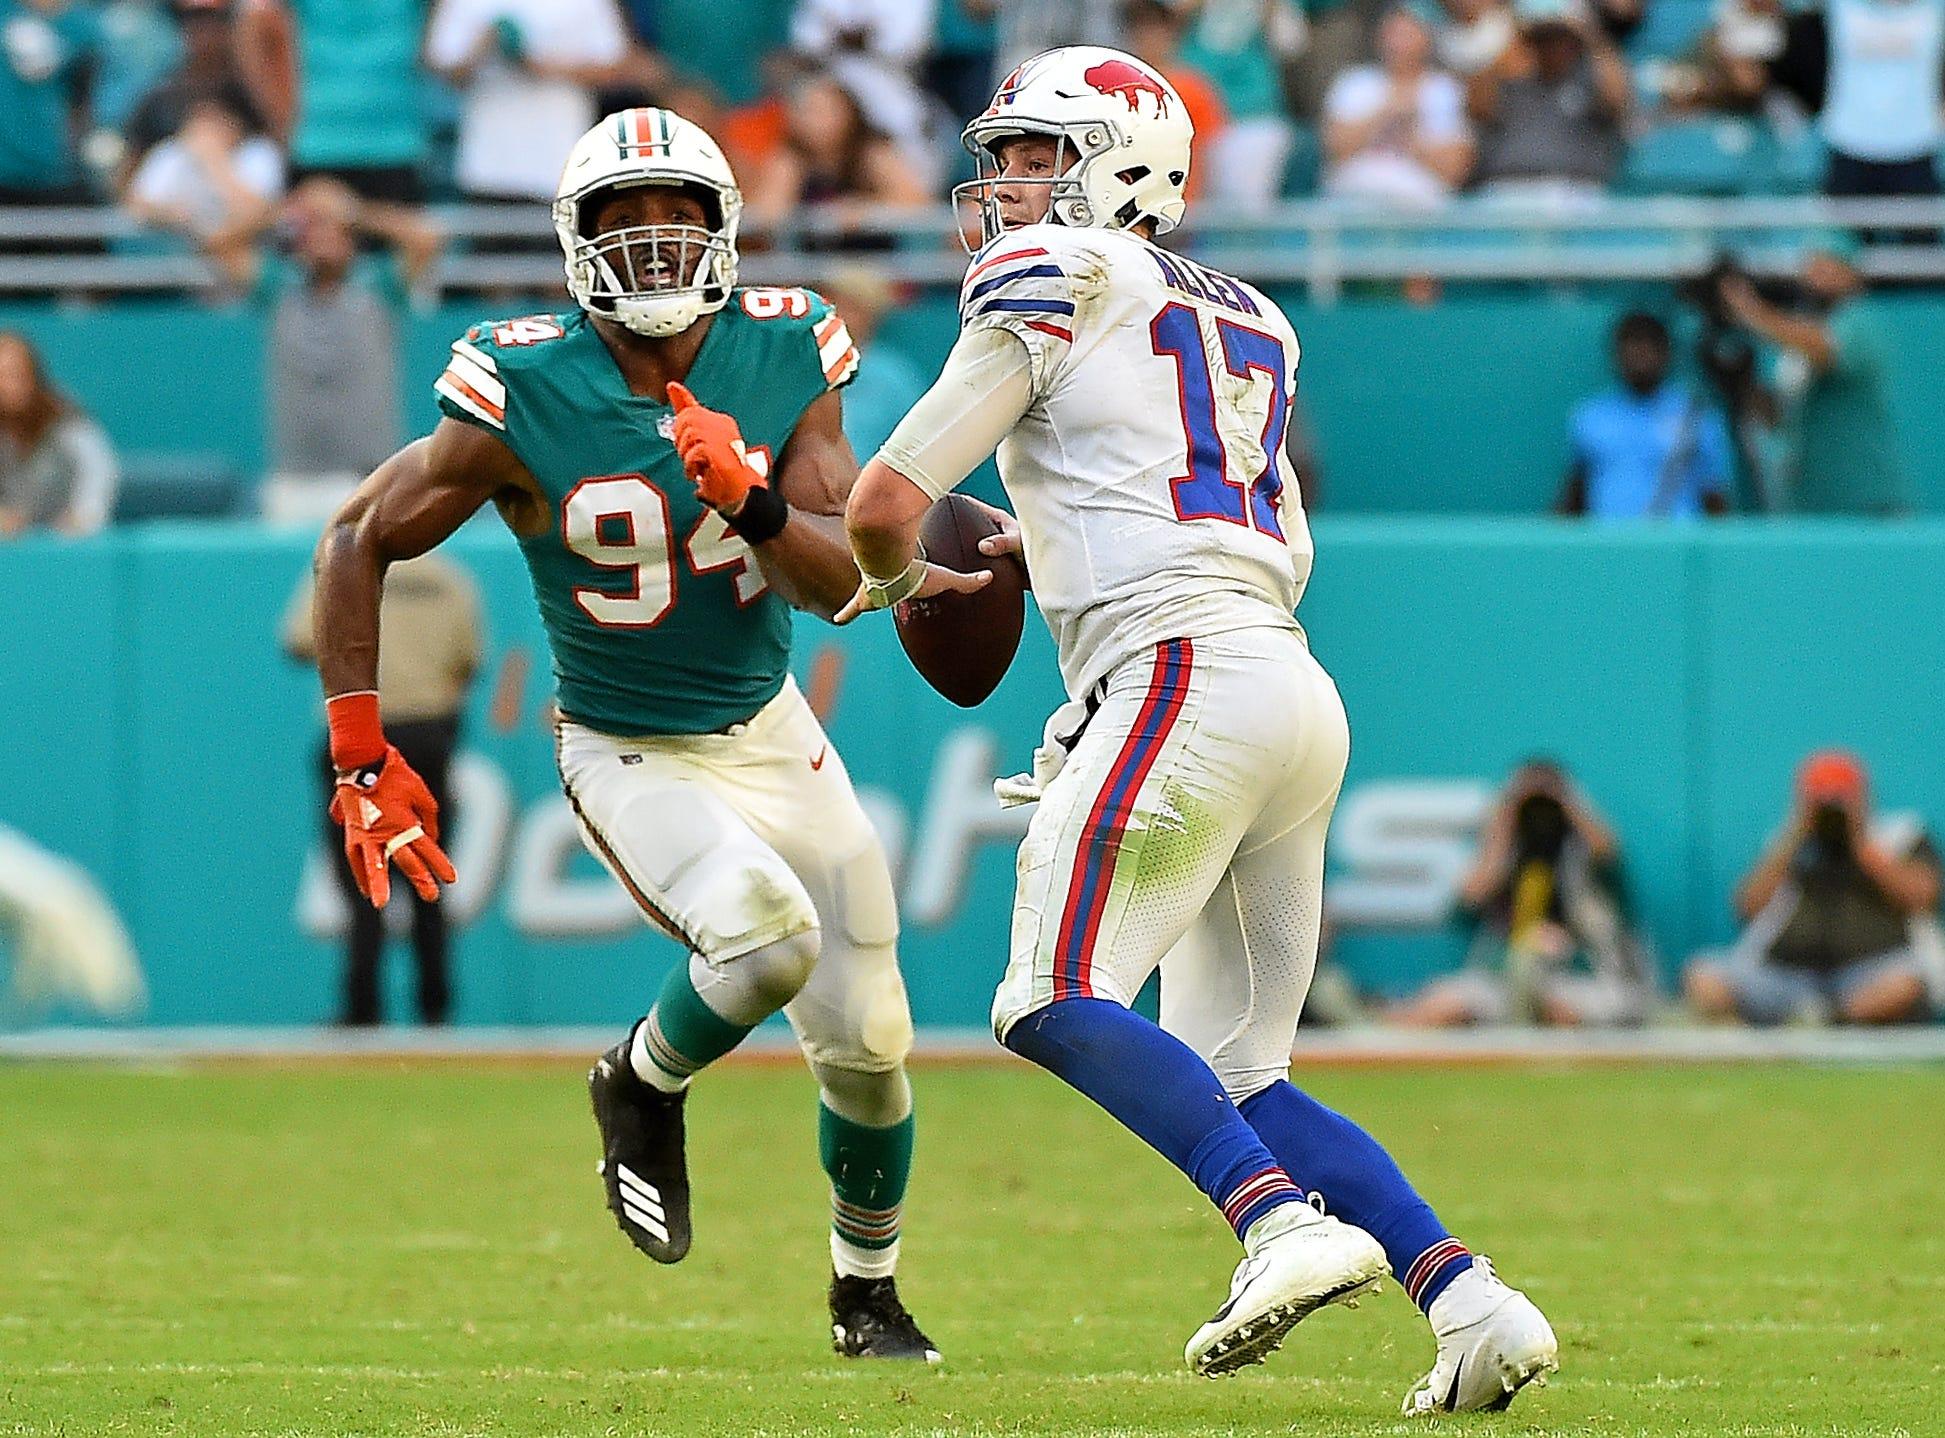 Buffalo Bills quarterback Josh Allen (17) attempts a pass under pressure from Miami Dolphins defensive end Robert Quinn (94) during the second half at Hard Rock Stadium.